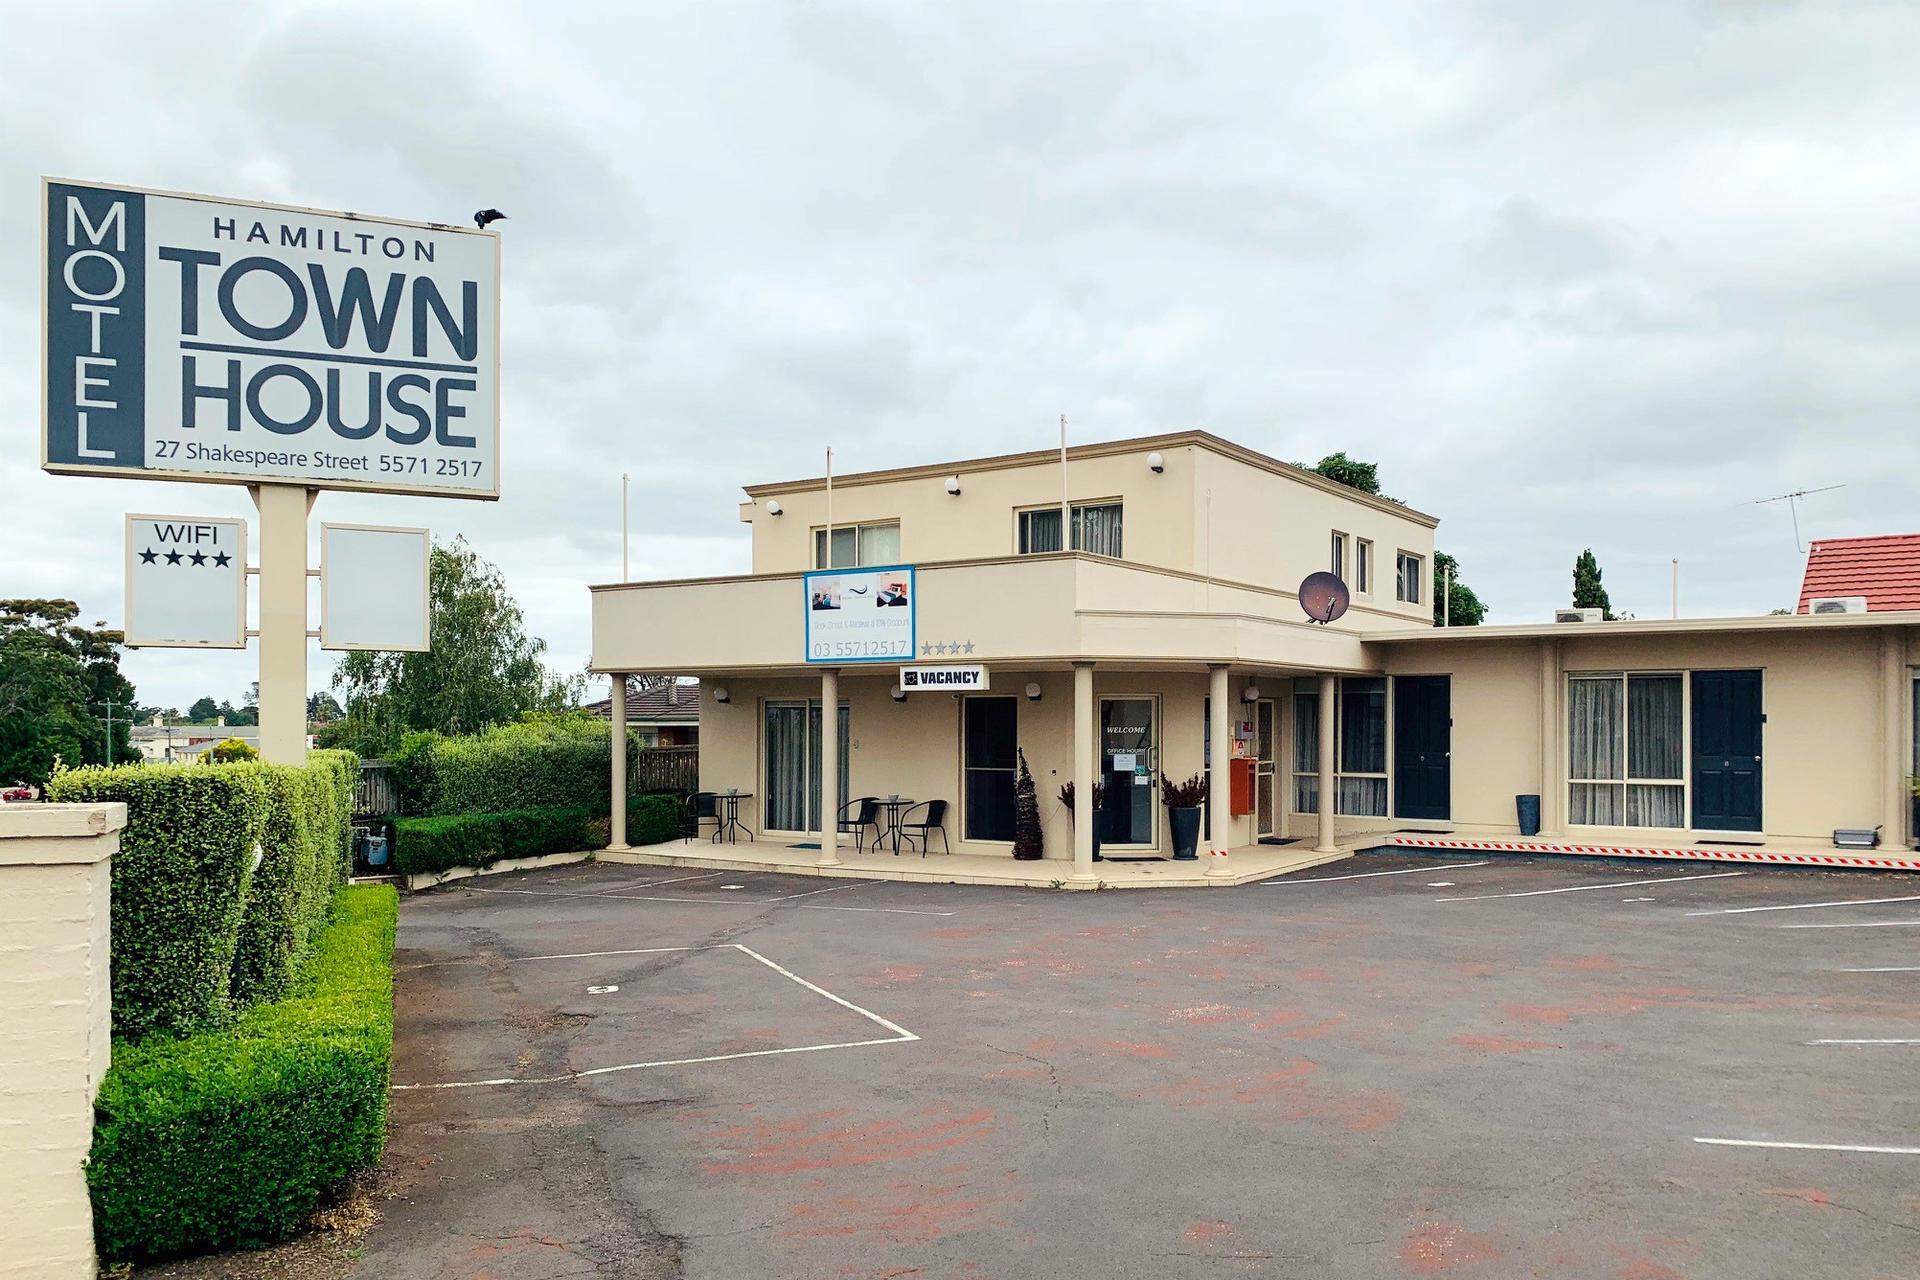 k - Hamilton Townhouse Motel